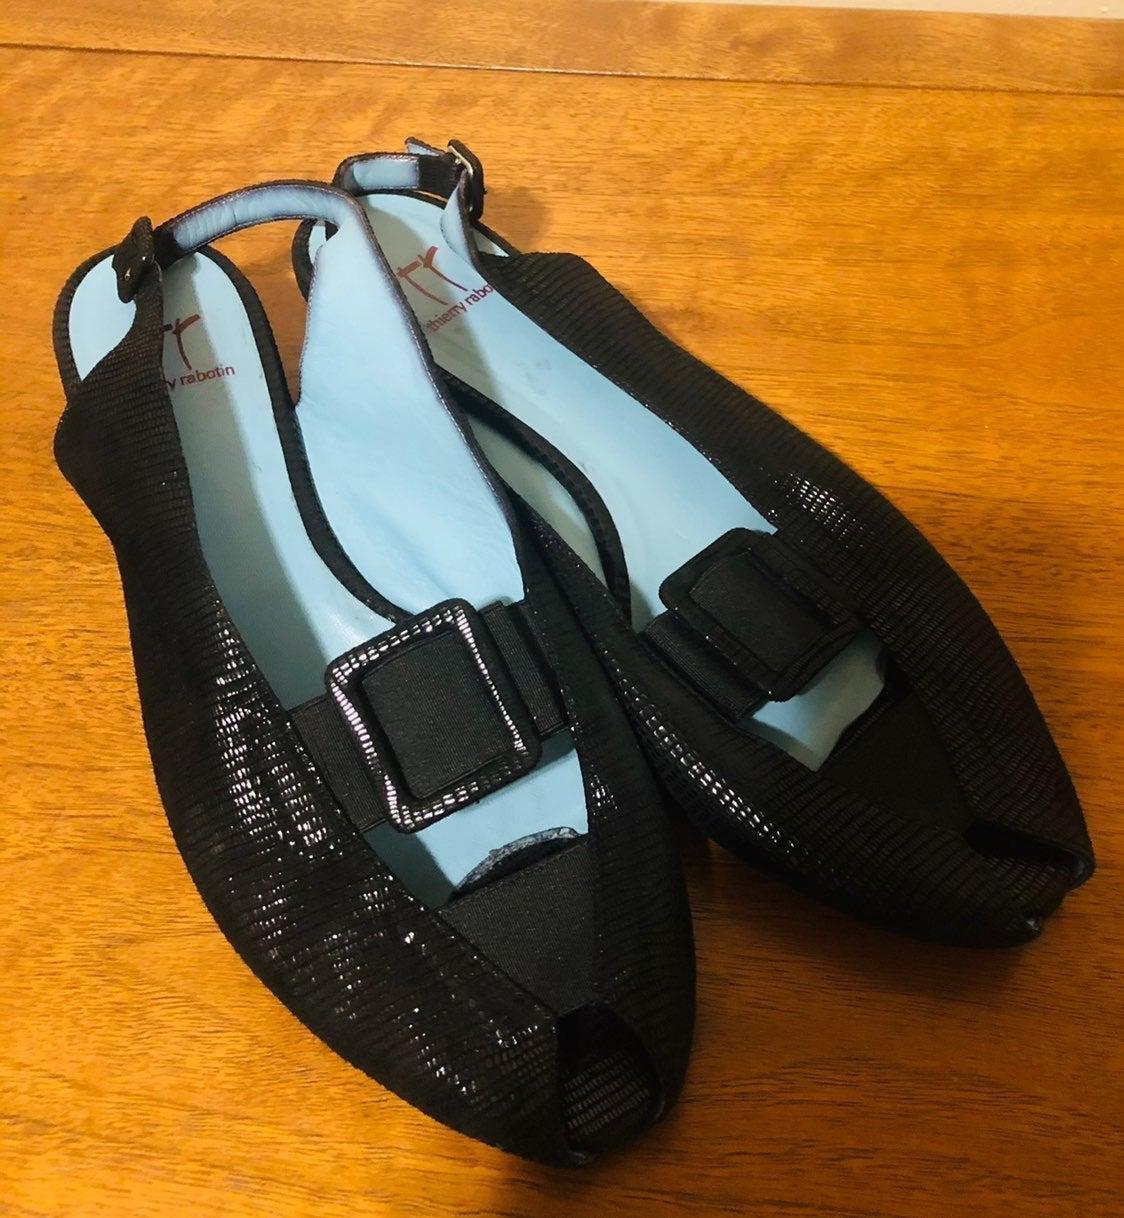 Thierry Rabotin Black Sandals 10.5